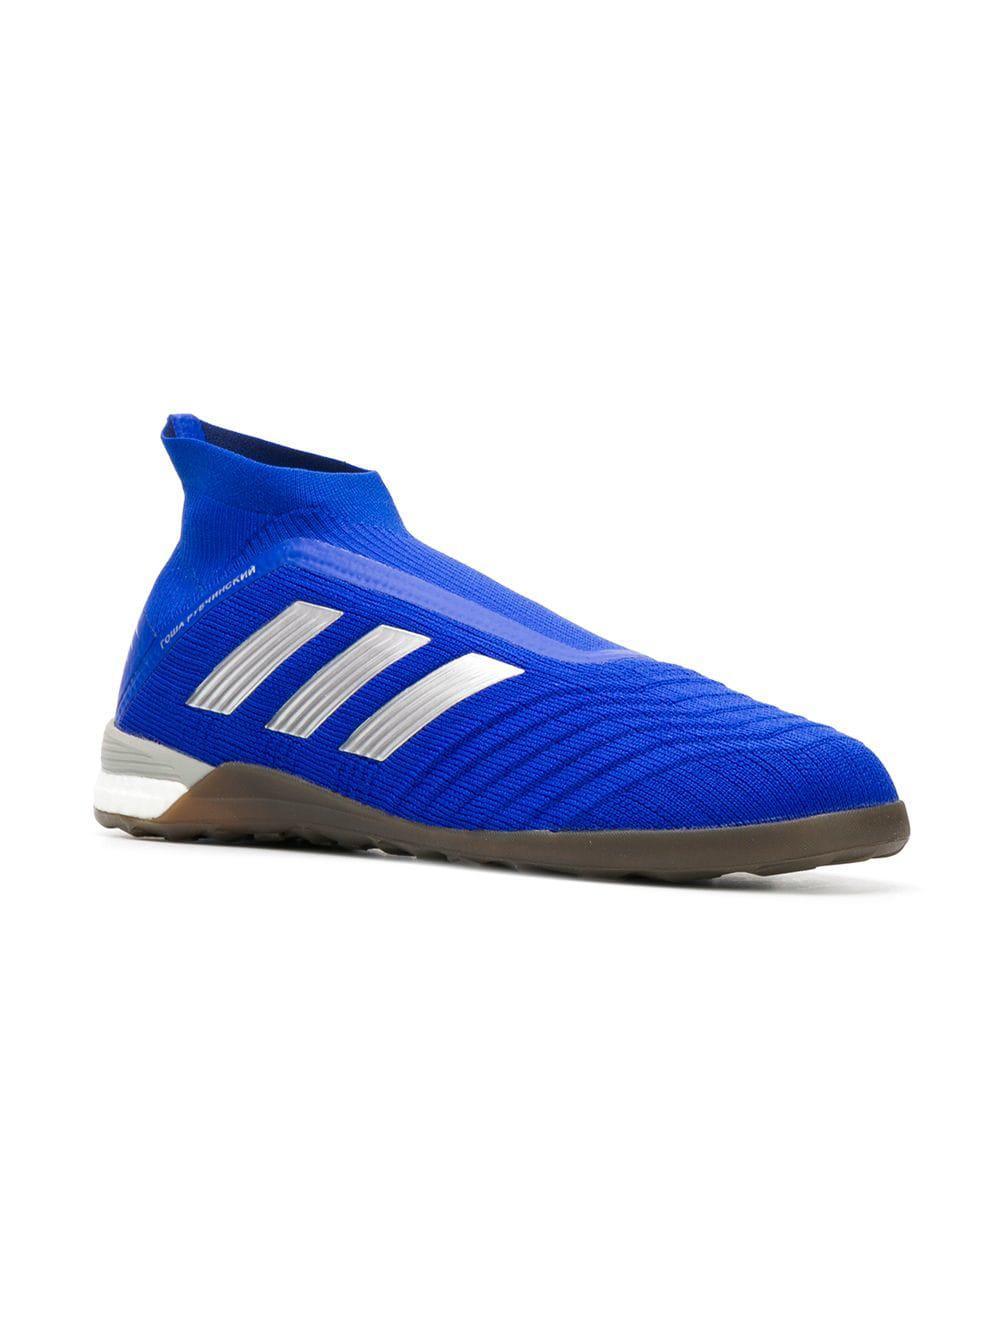 8f472a250 Gosha Rubchinskiy - Blue X Adidas Predator Sneakers for Men - Lyst. View  fullscreen